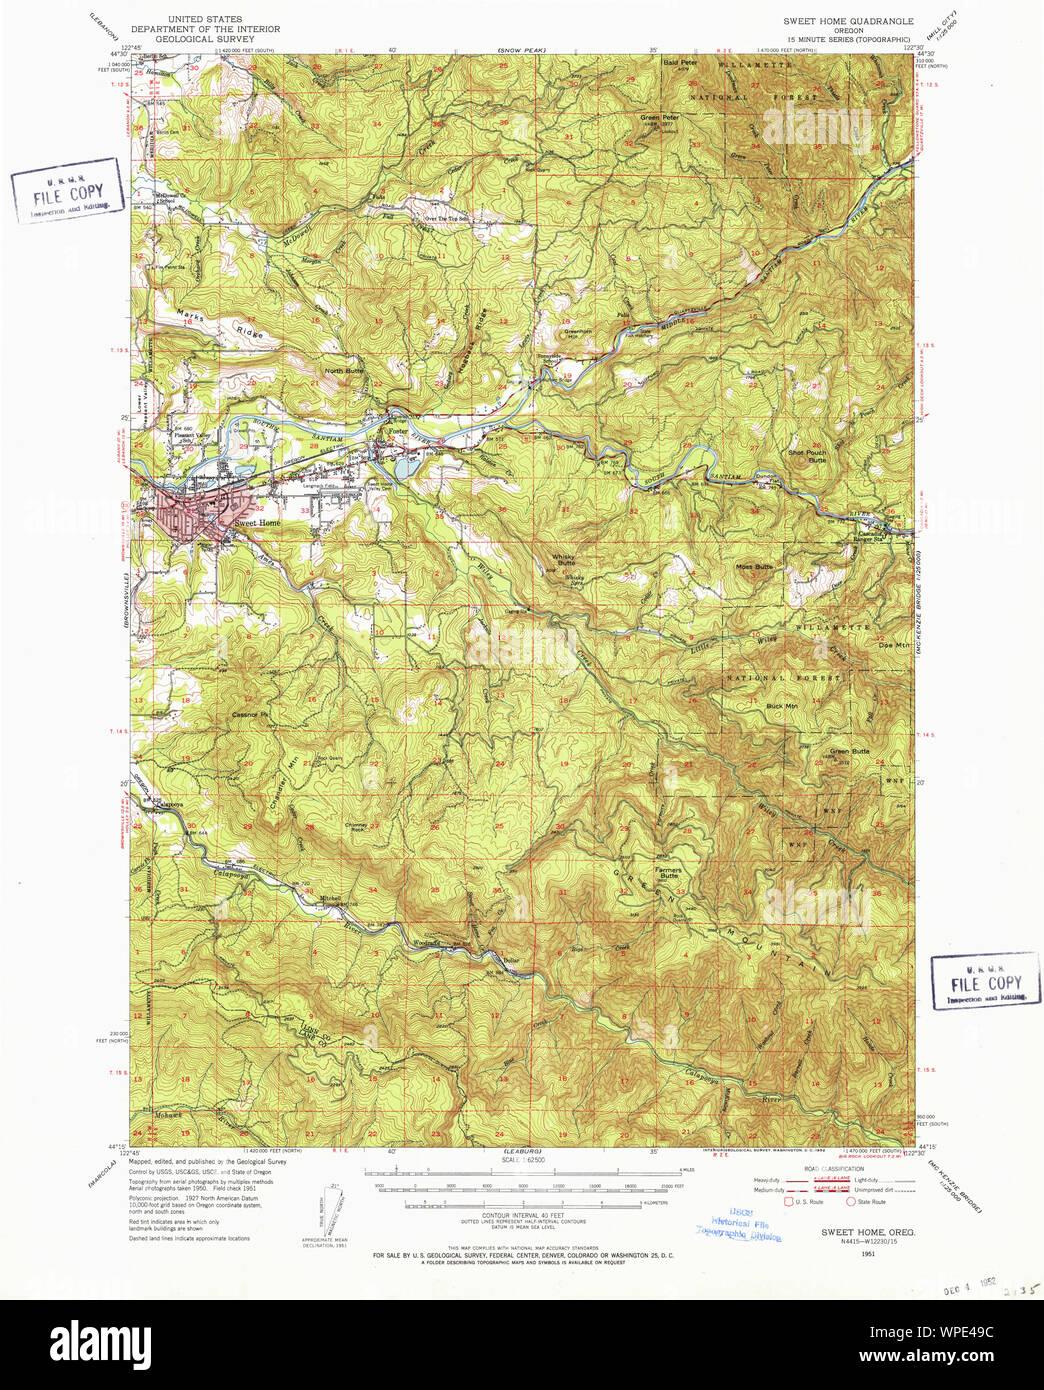 Usgs Topo Map Oregon Sweet Home 282937 1951 62500